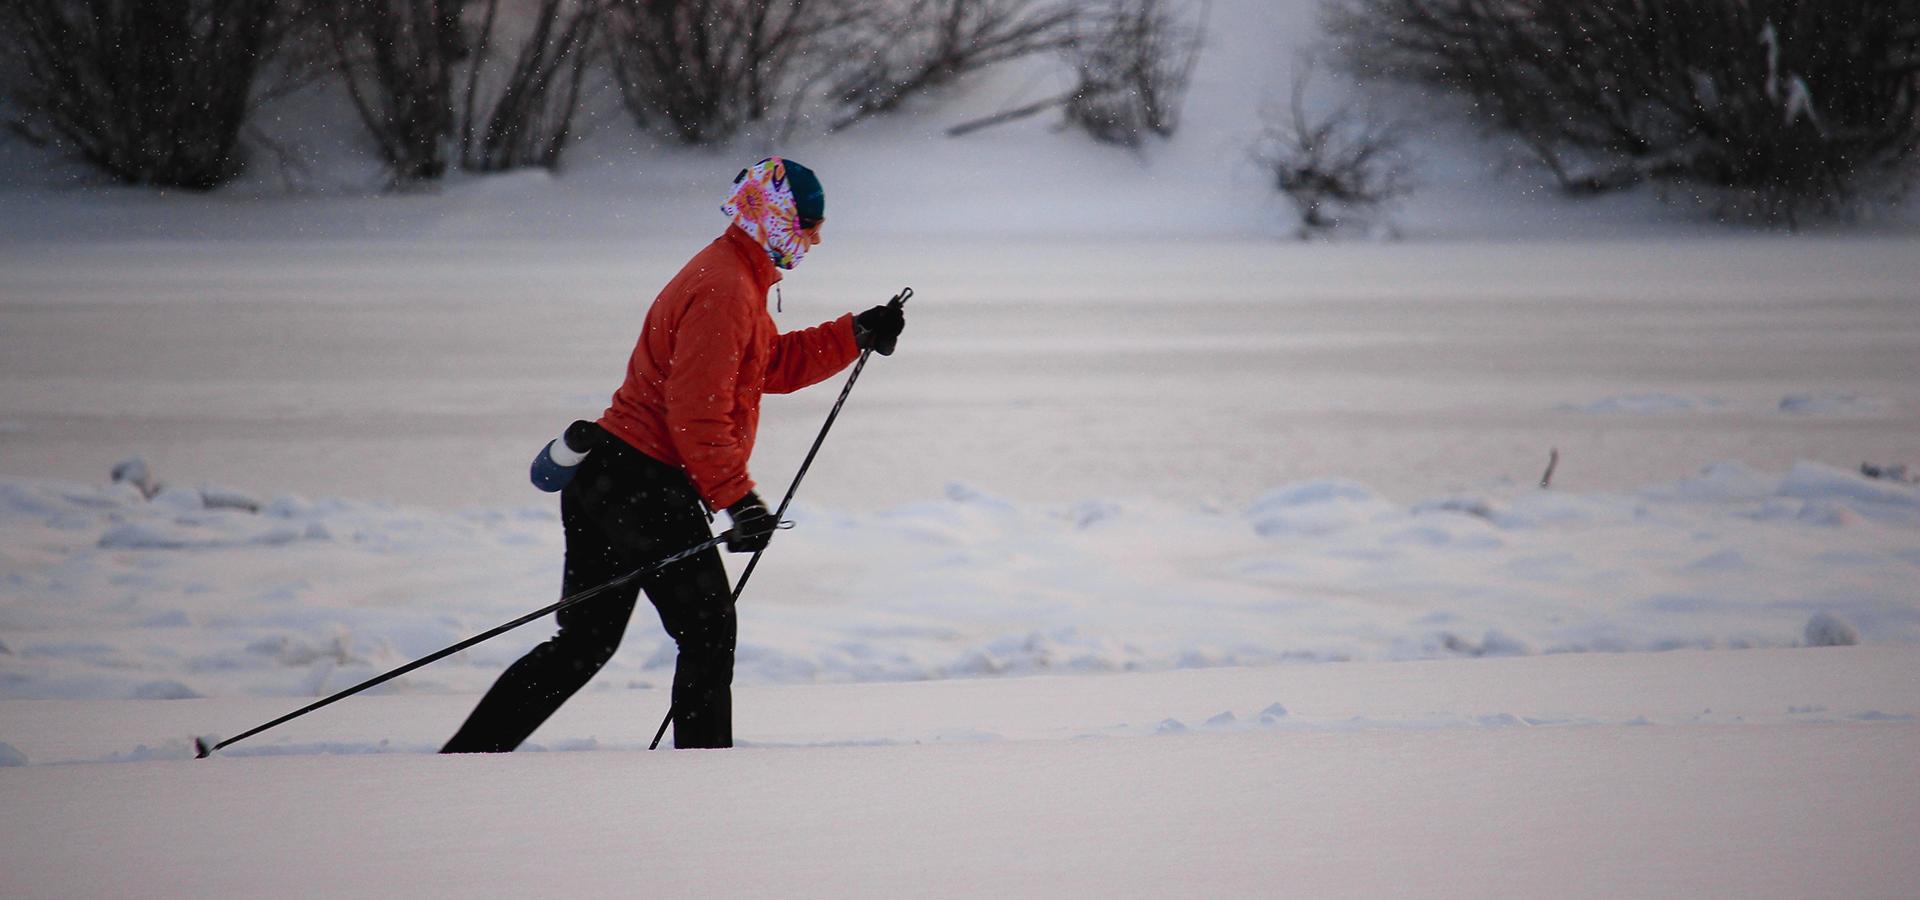 Riverbend-Park-Winter-Skiing